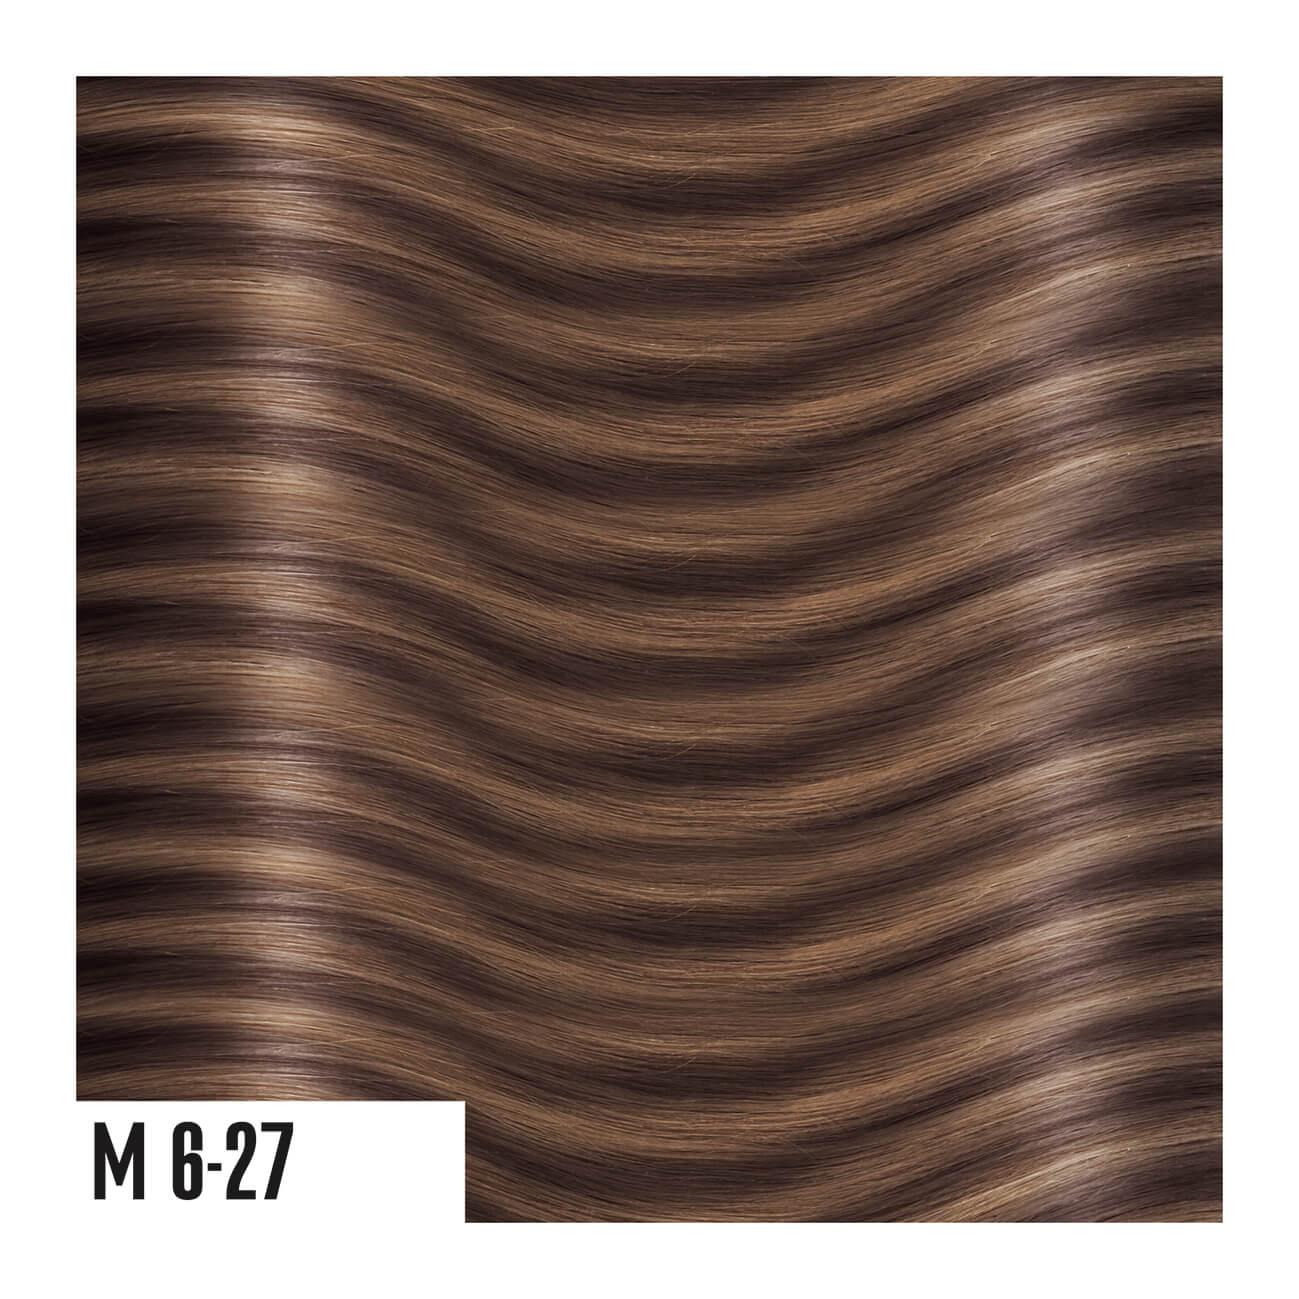 M6-27